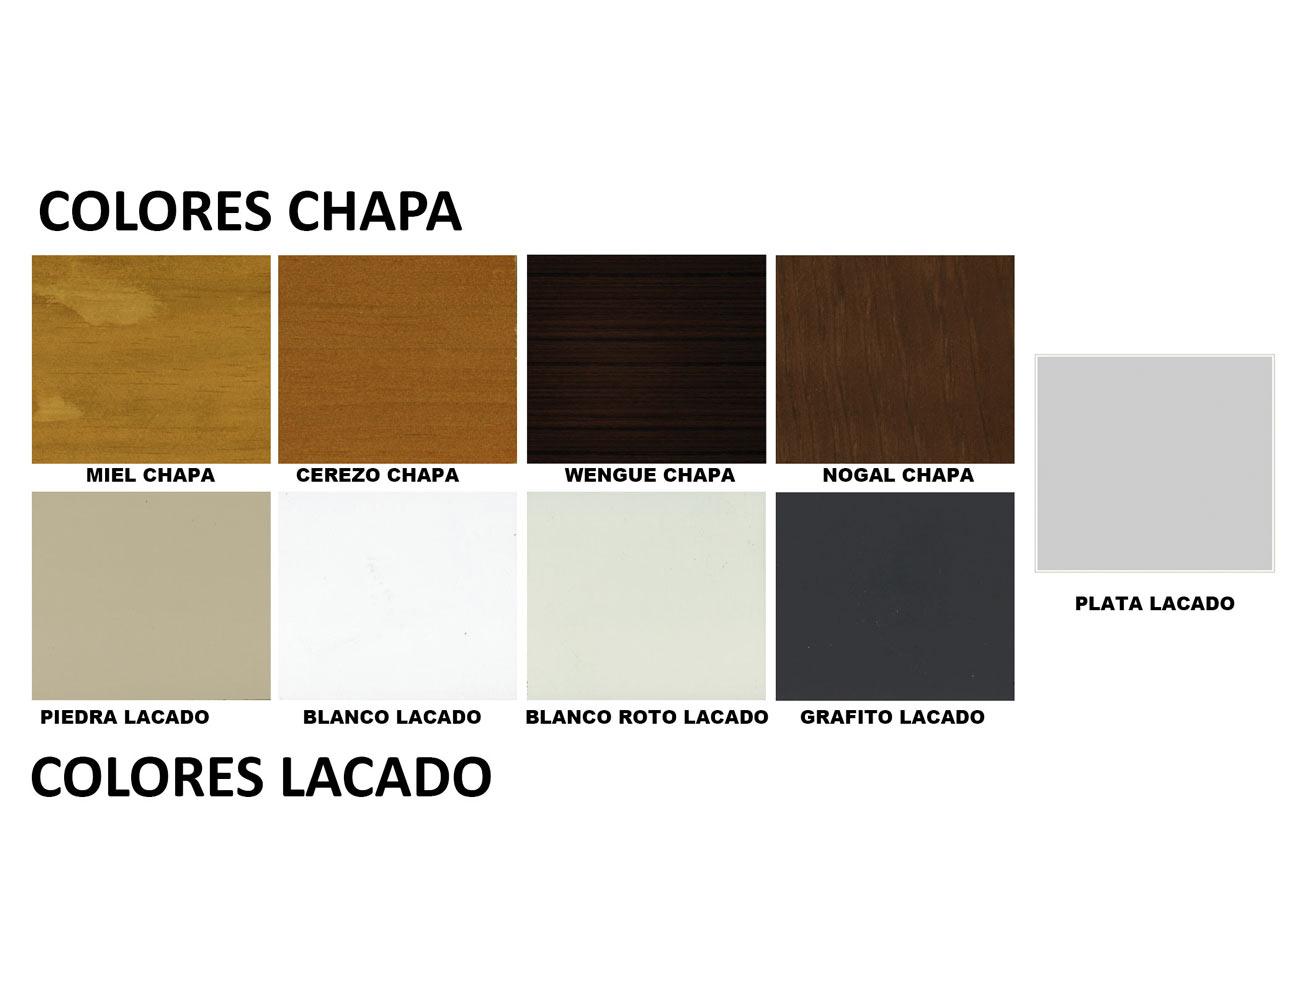 Colores228